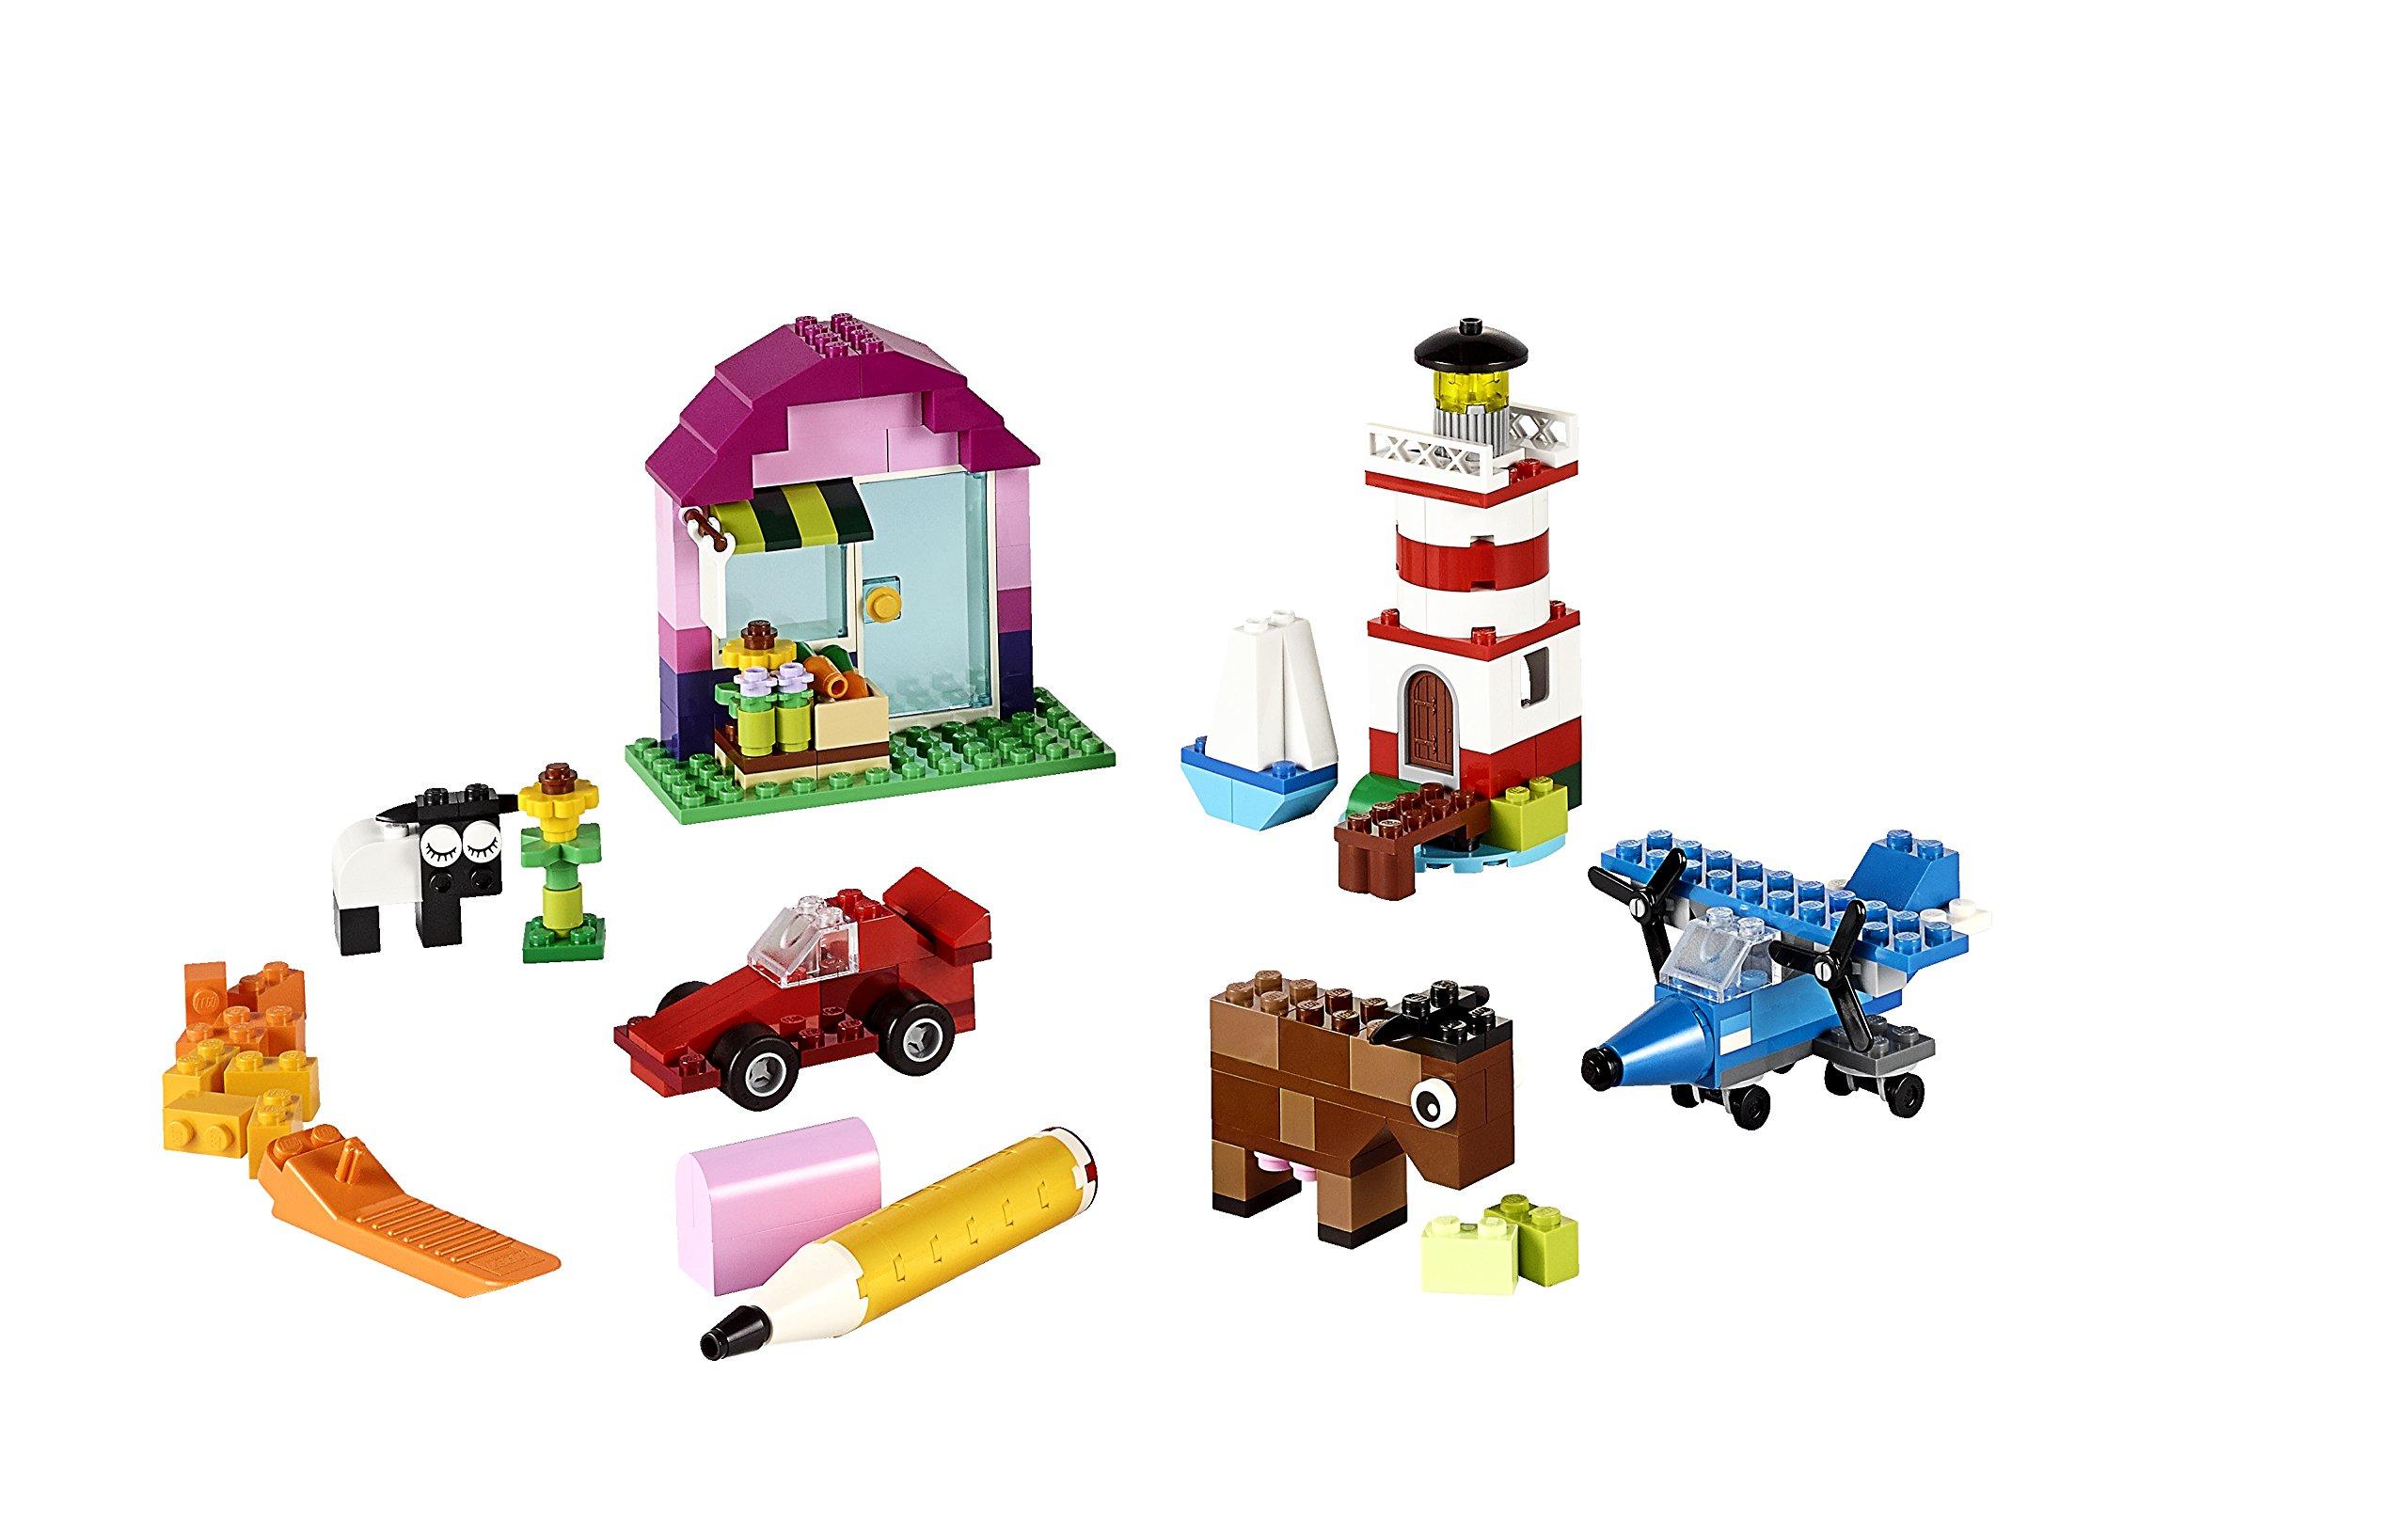 LEGO Classic Creative Bricks 10692 Building Blocks, Learning Toy by LEGO (Image #4)